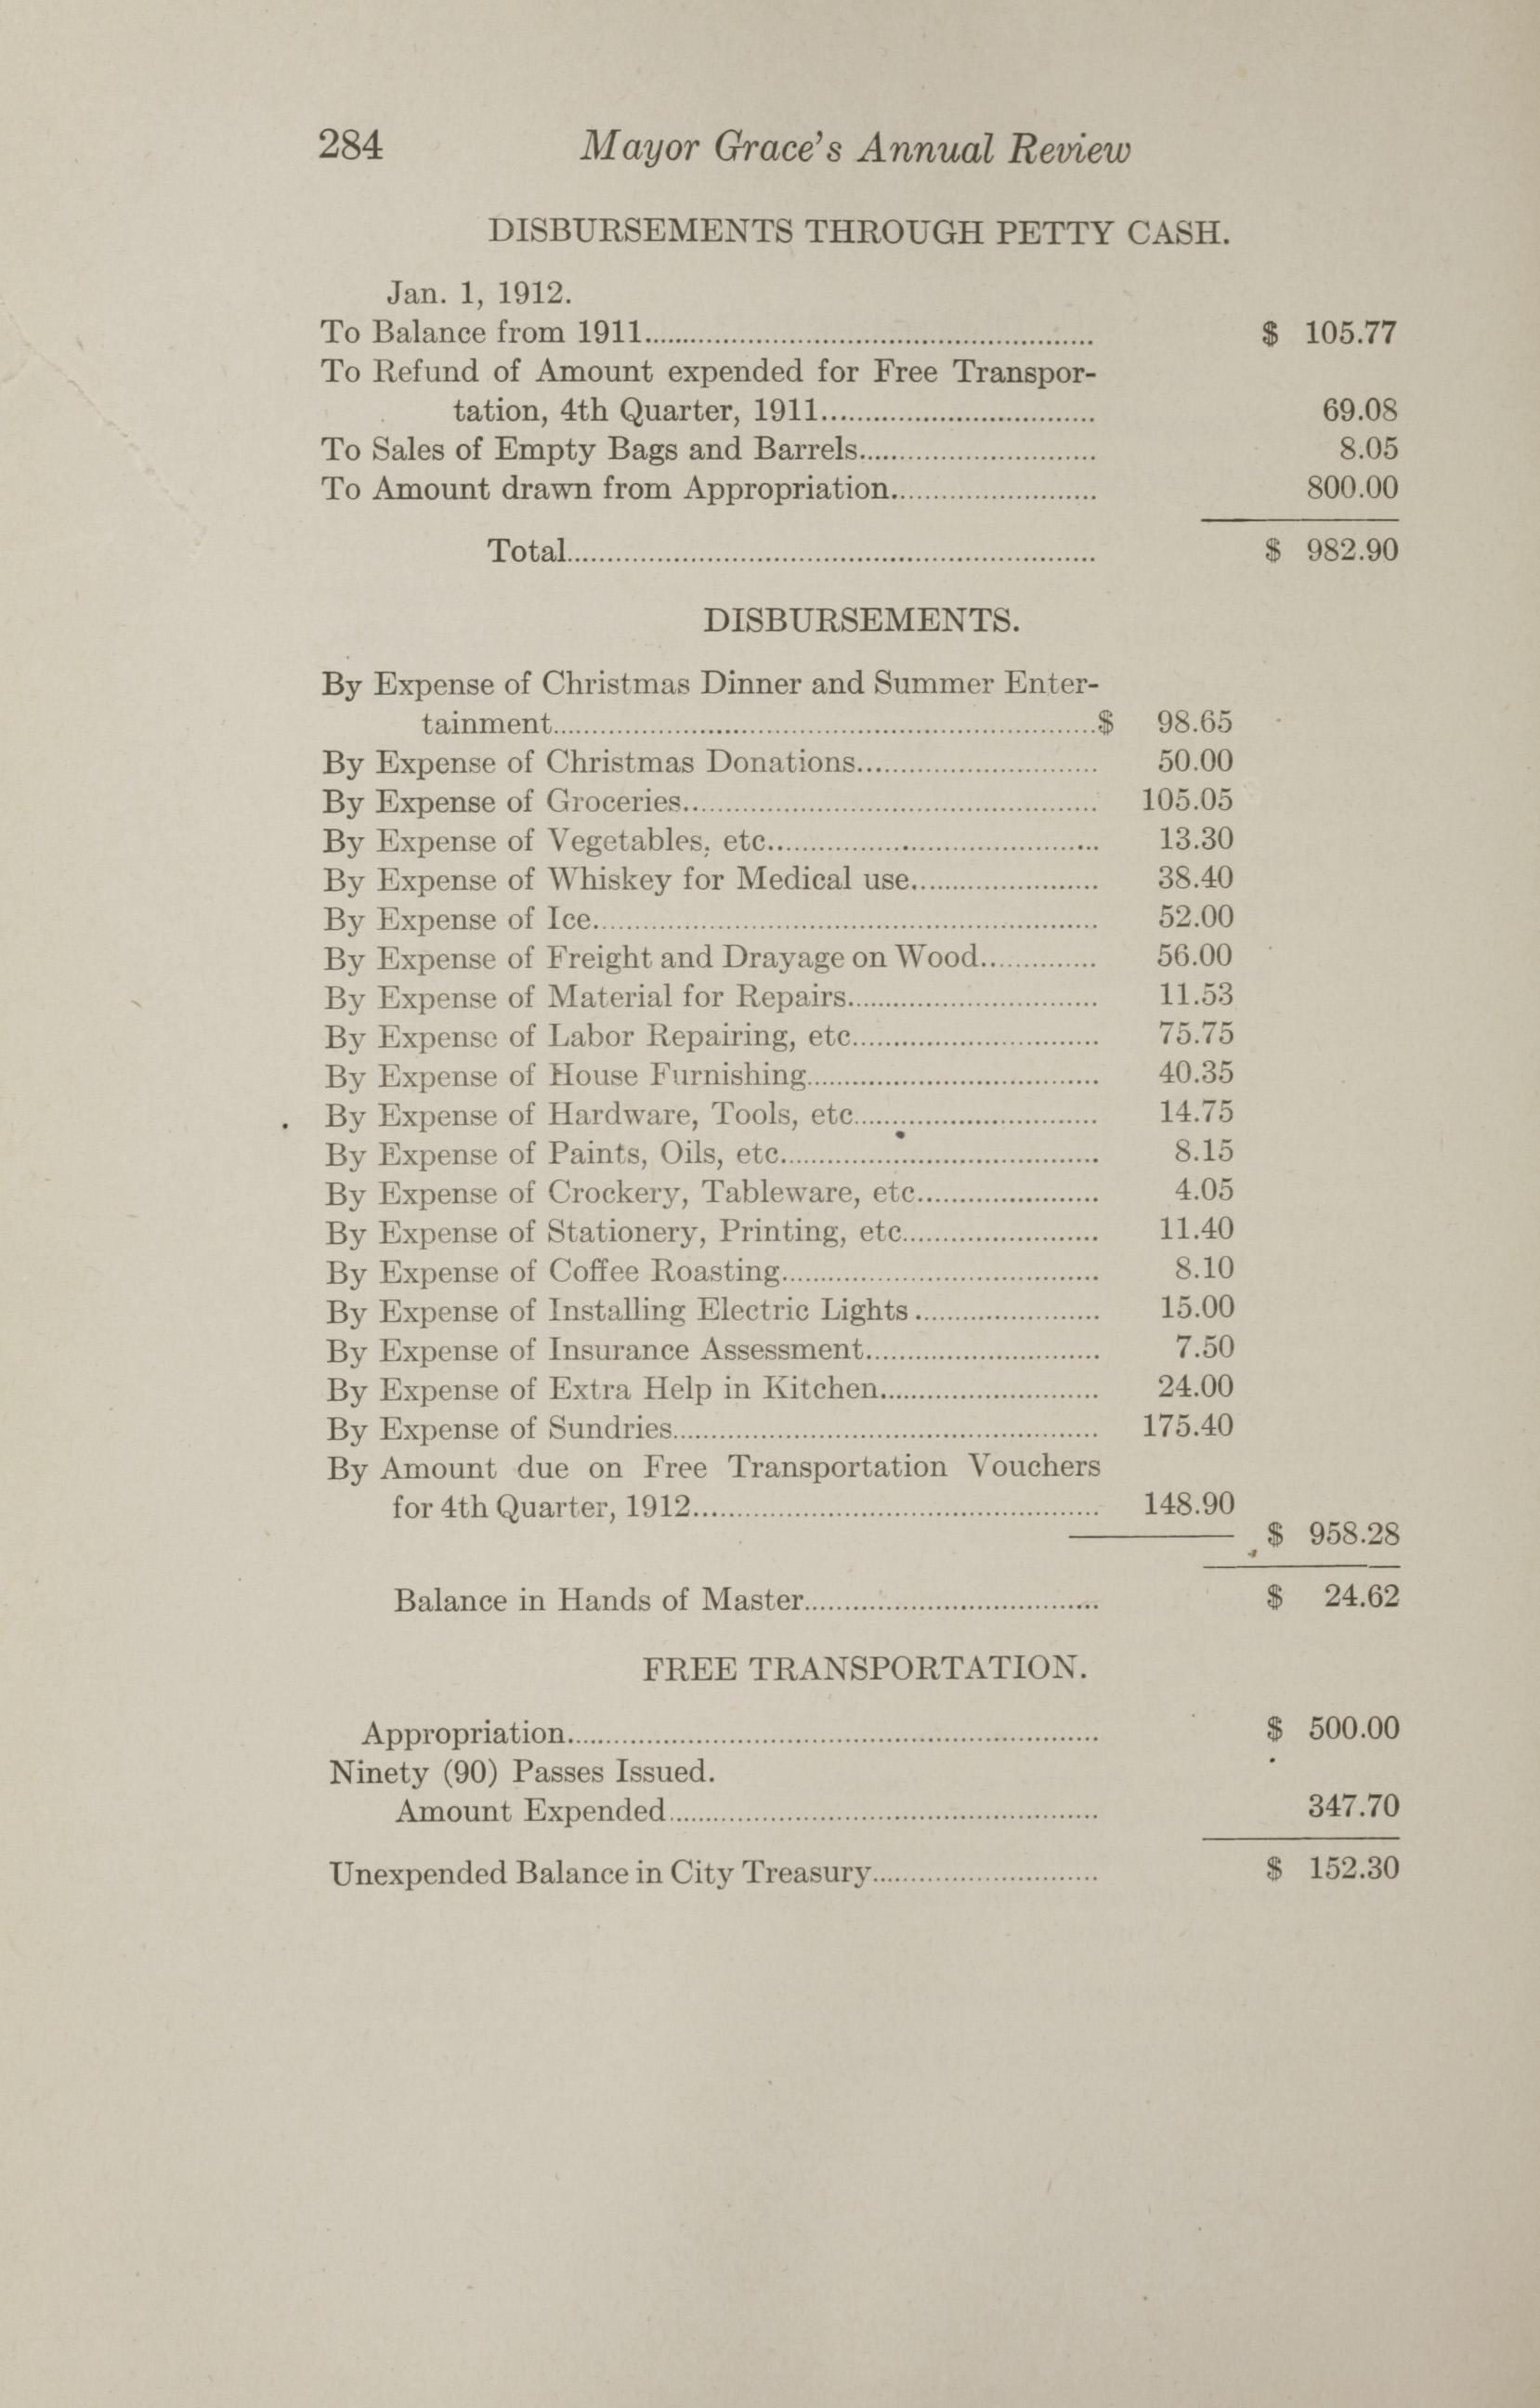 Charleston Yearbook, 1912, page 284